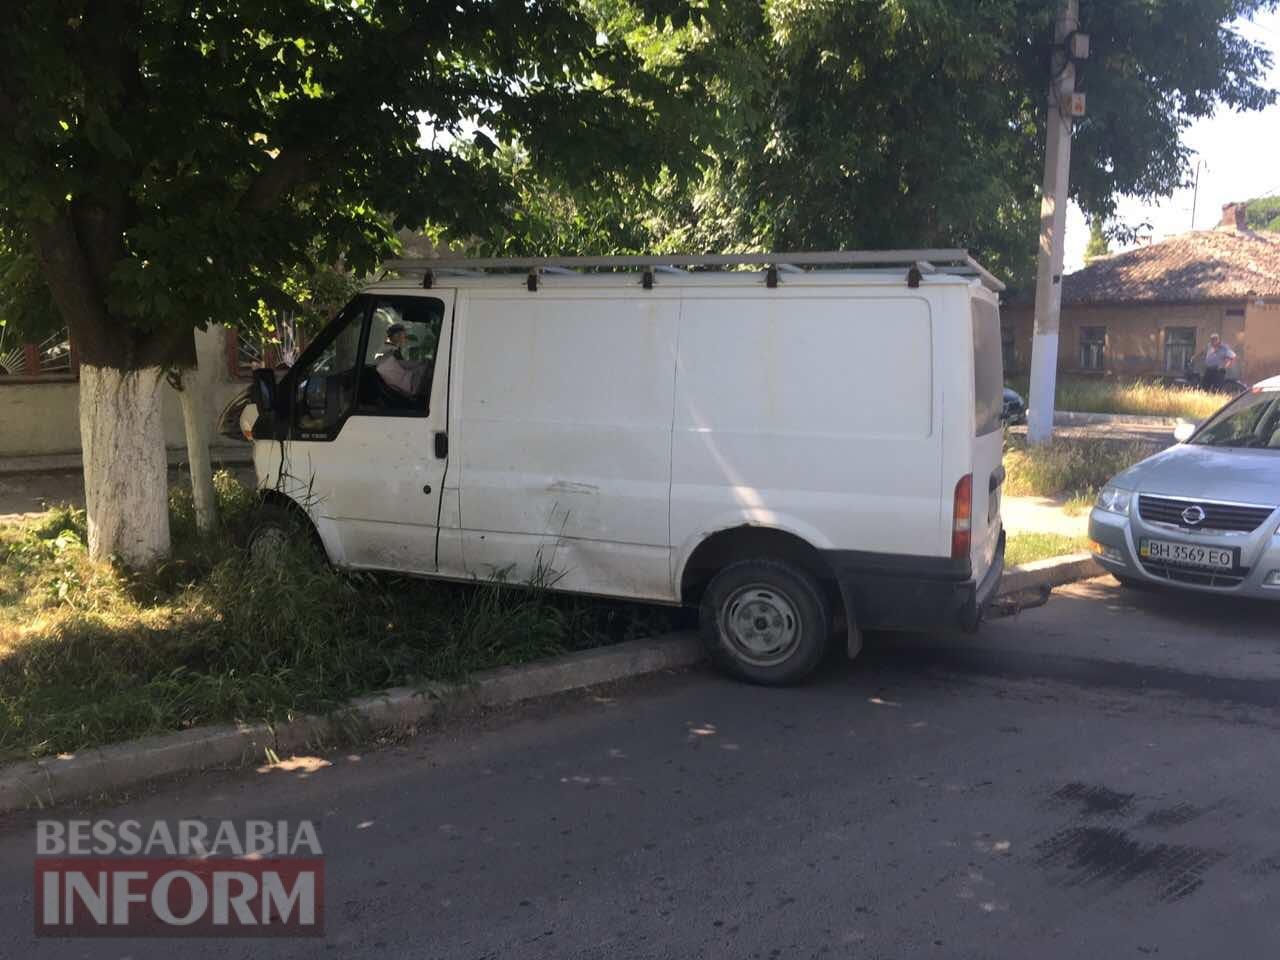 59315bb338b5f_234643743573457 ДТП в Измаиле: дорогу не поделили Ford Tranzit и Nissan Primera